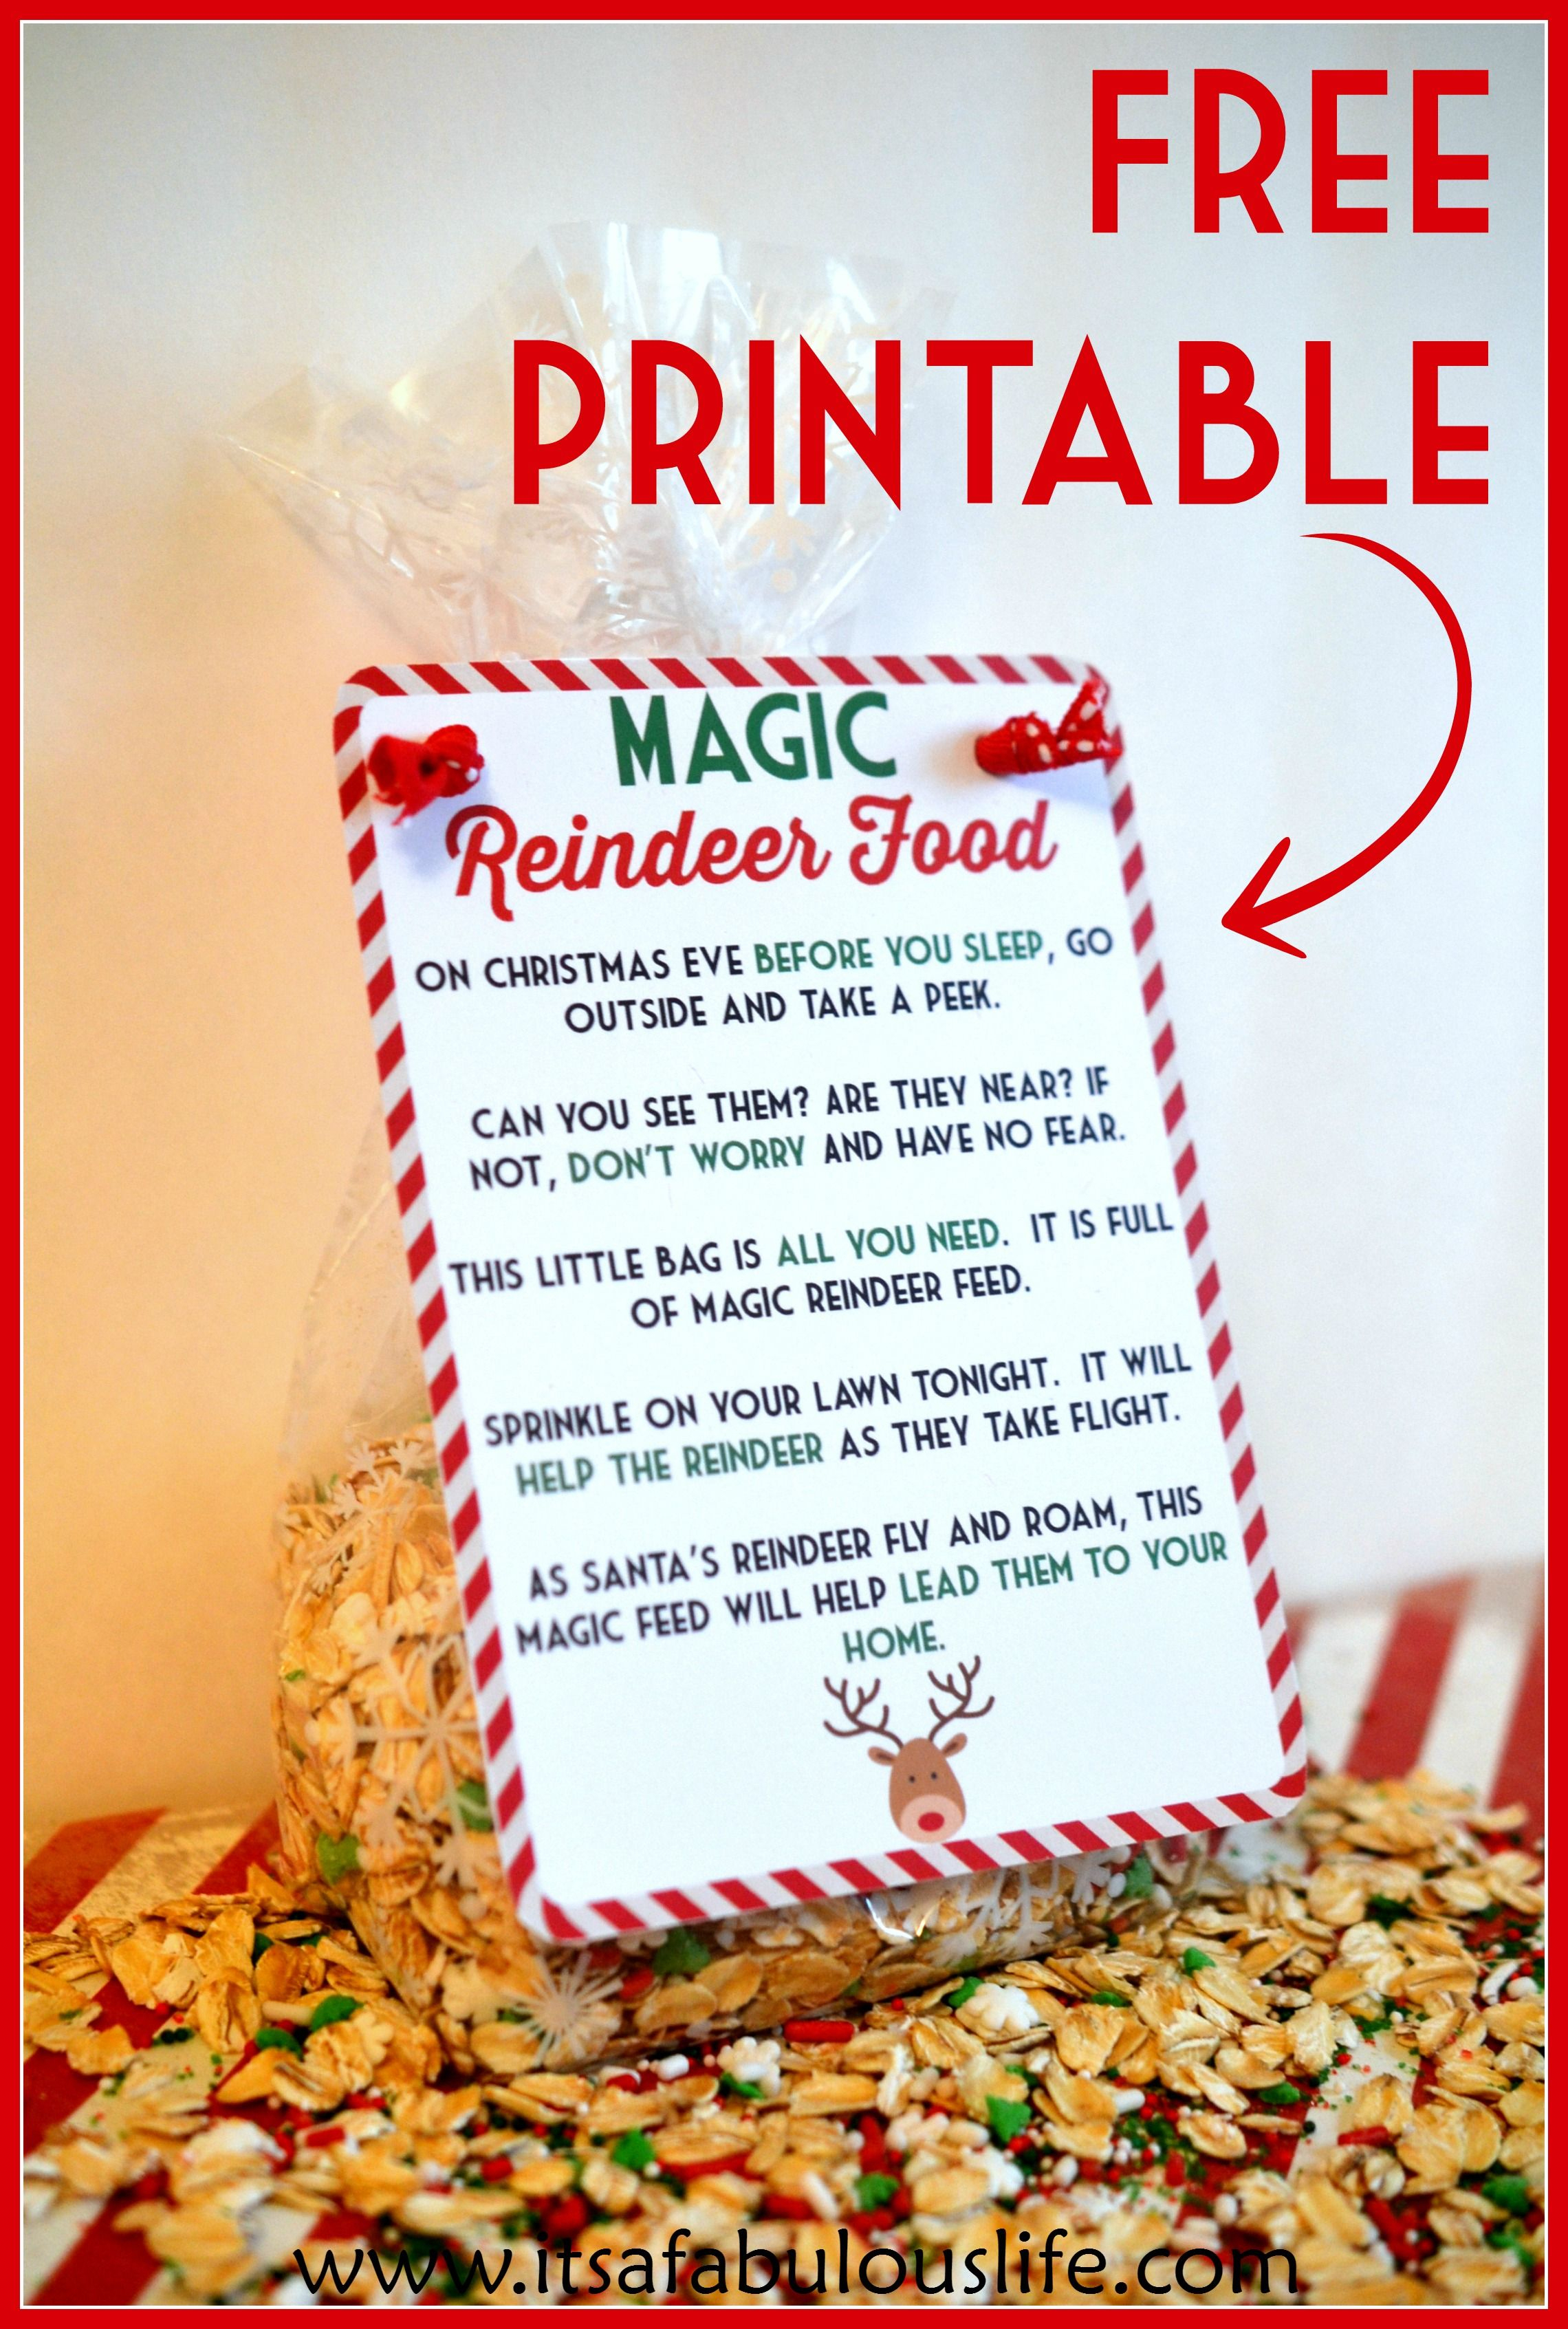 Magic Reindeer Food Poem & Free Printable   Little People, Big - Reindeer Food Poem Free Printable